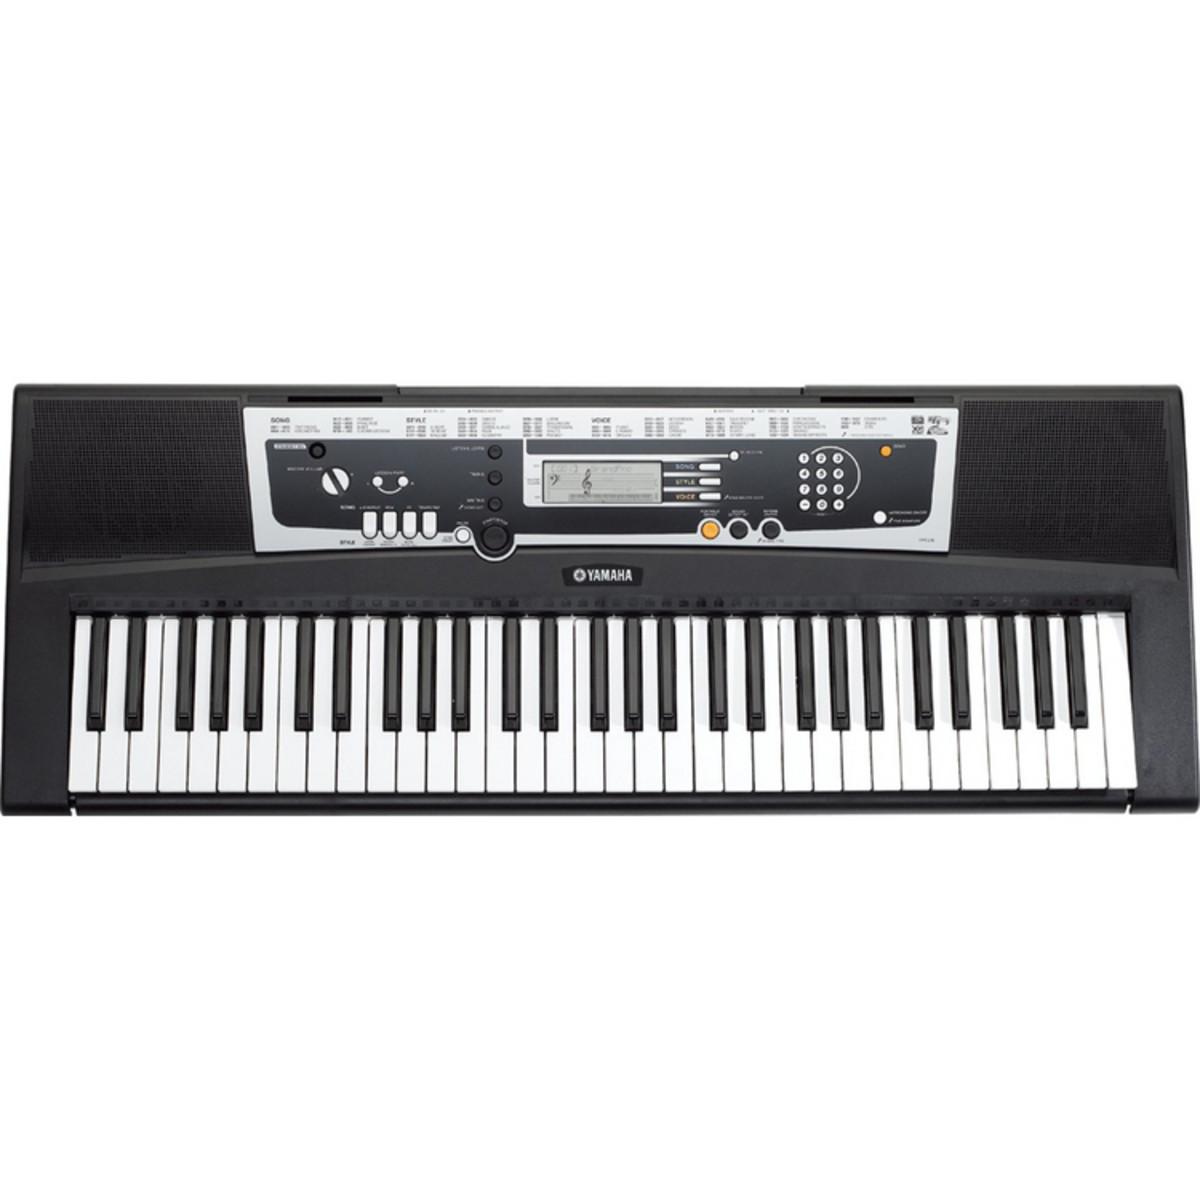 yamaha ypt 210 portable keyboard ex demo at gear4music com rh gear4music com yamaha psr 210 manual pdf yamaha psr 210 manual pdf